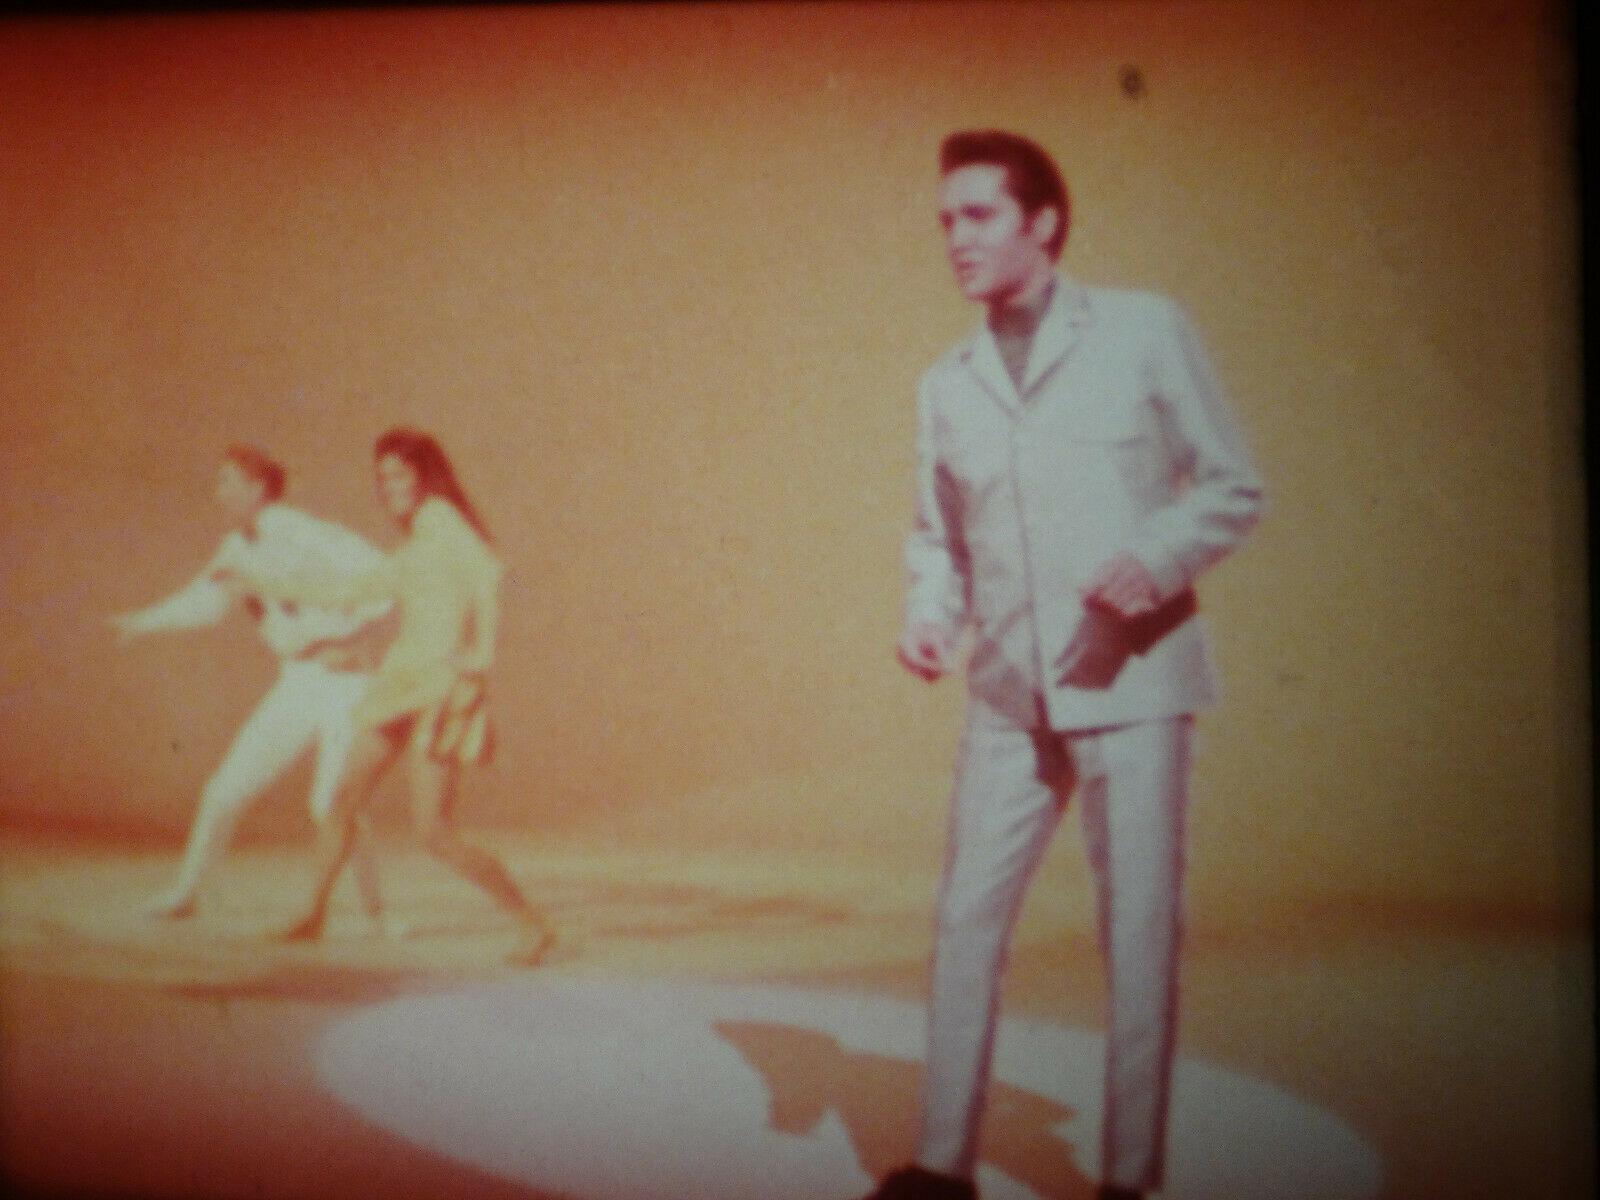 Elvis Presley in Live a Little, Love a Little (1968)